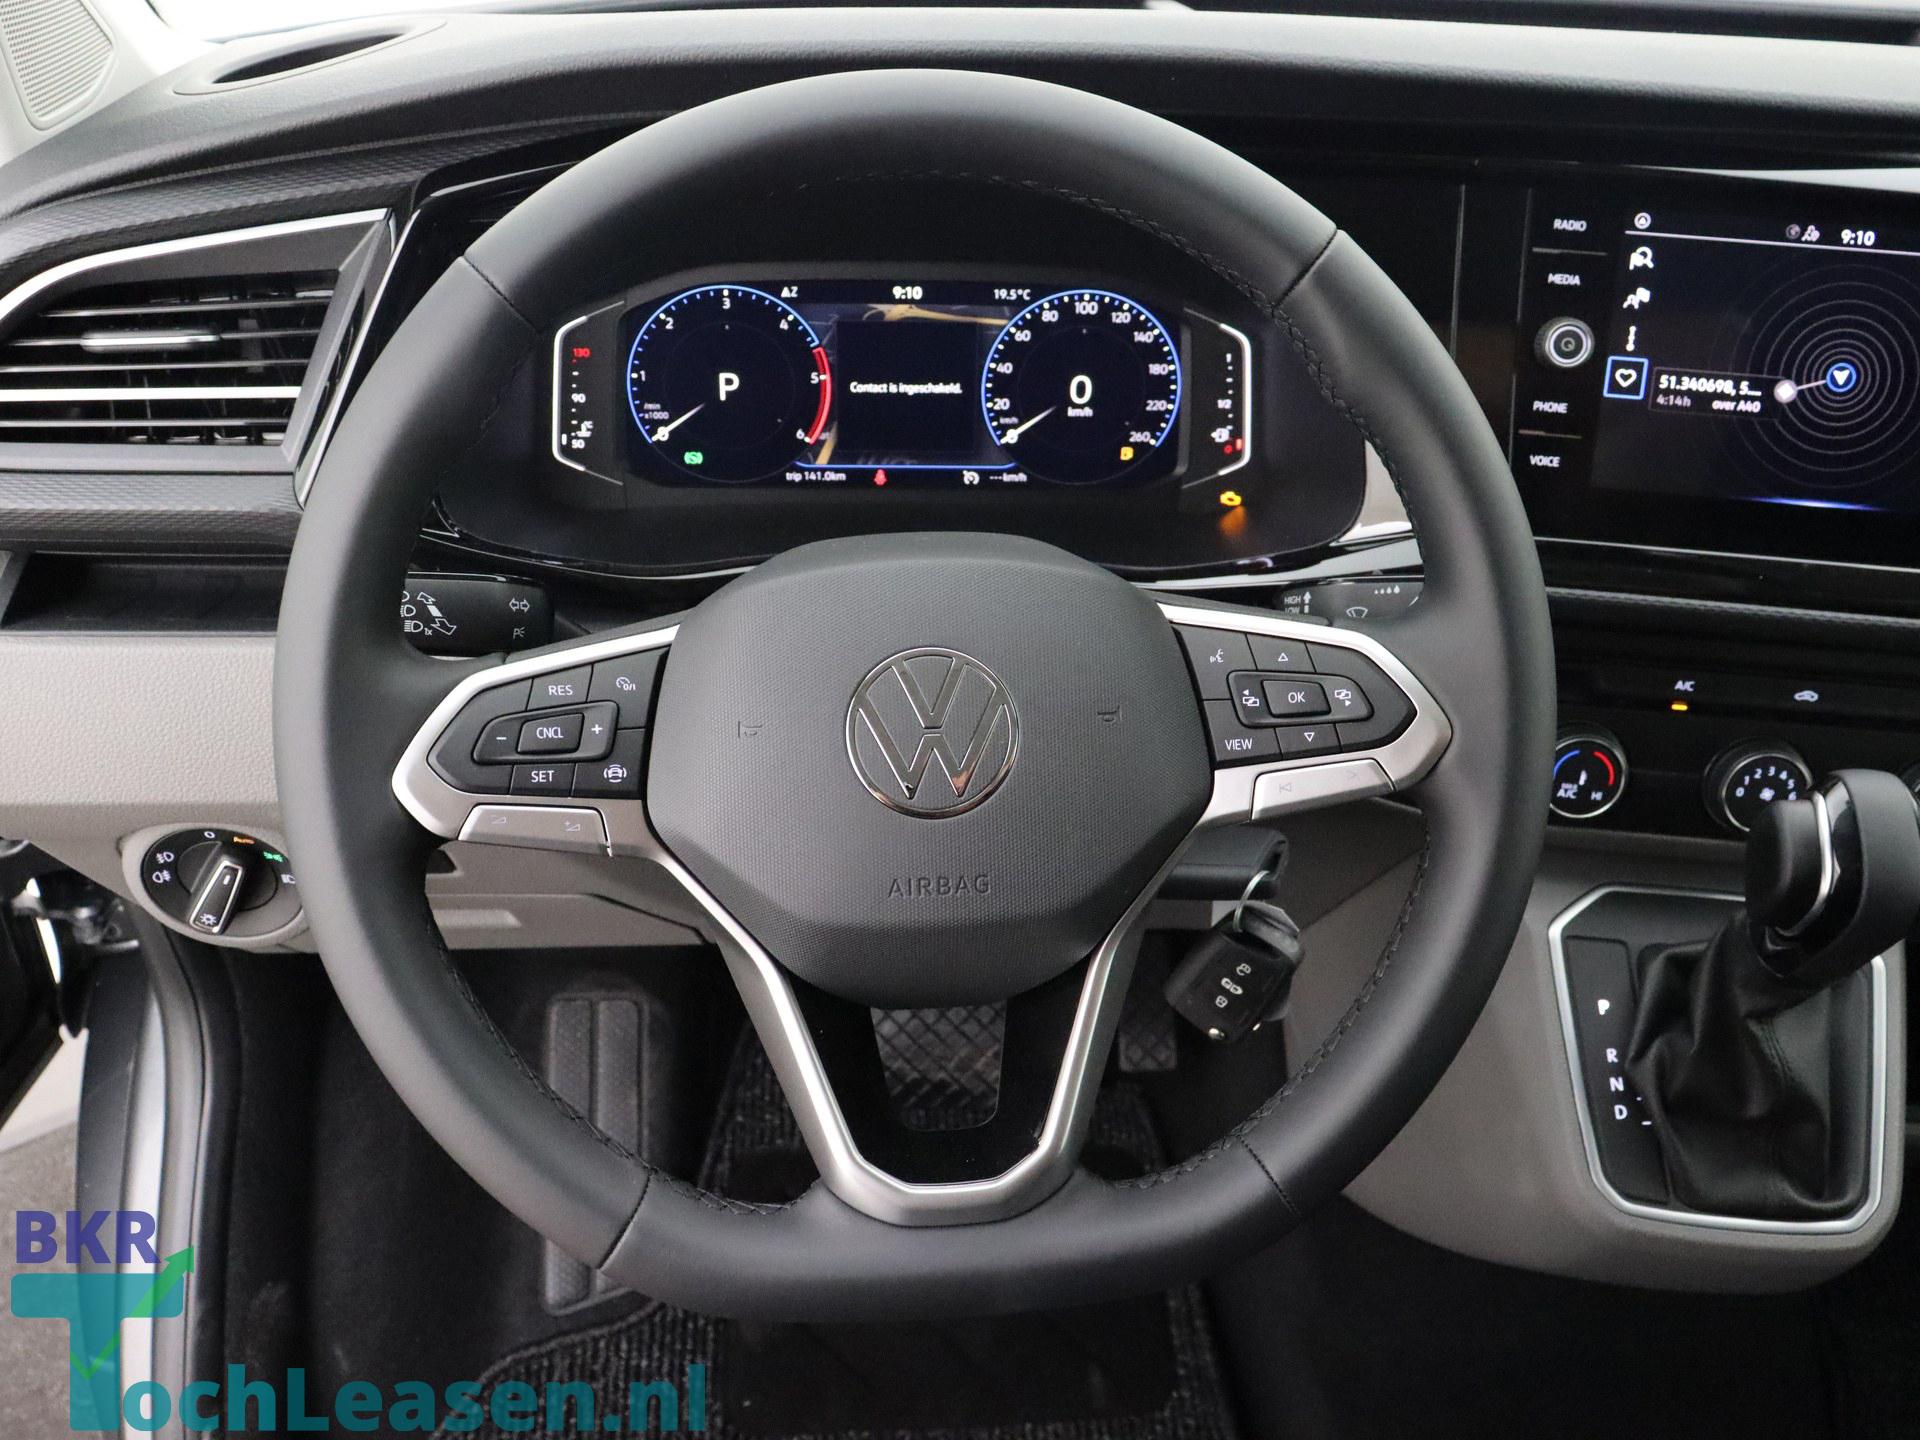 BKR toch leasen - Volkswagen Transporter - Grijs 5